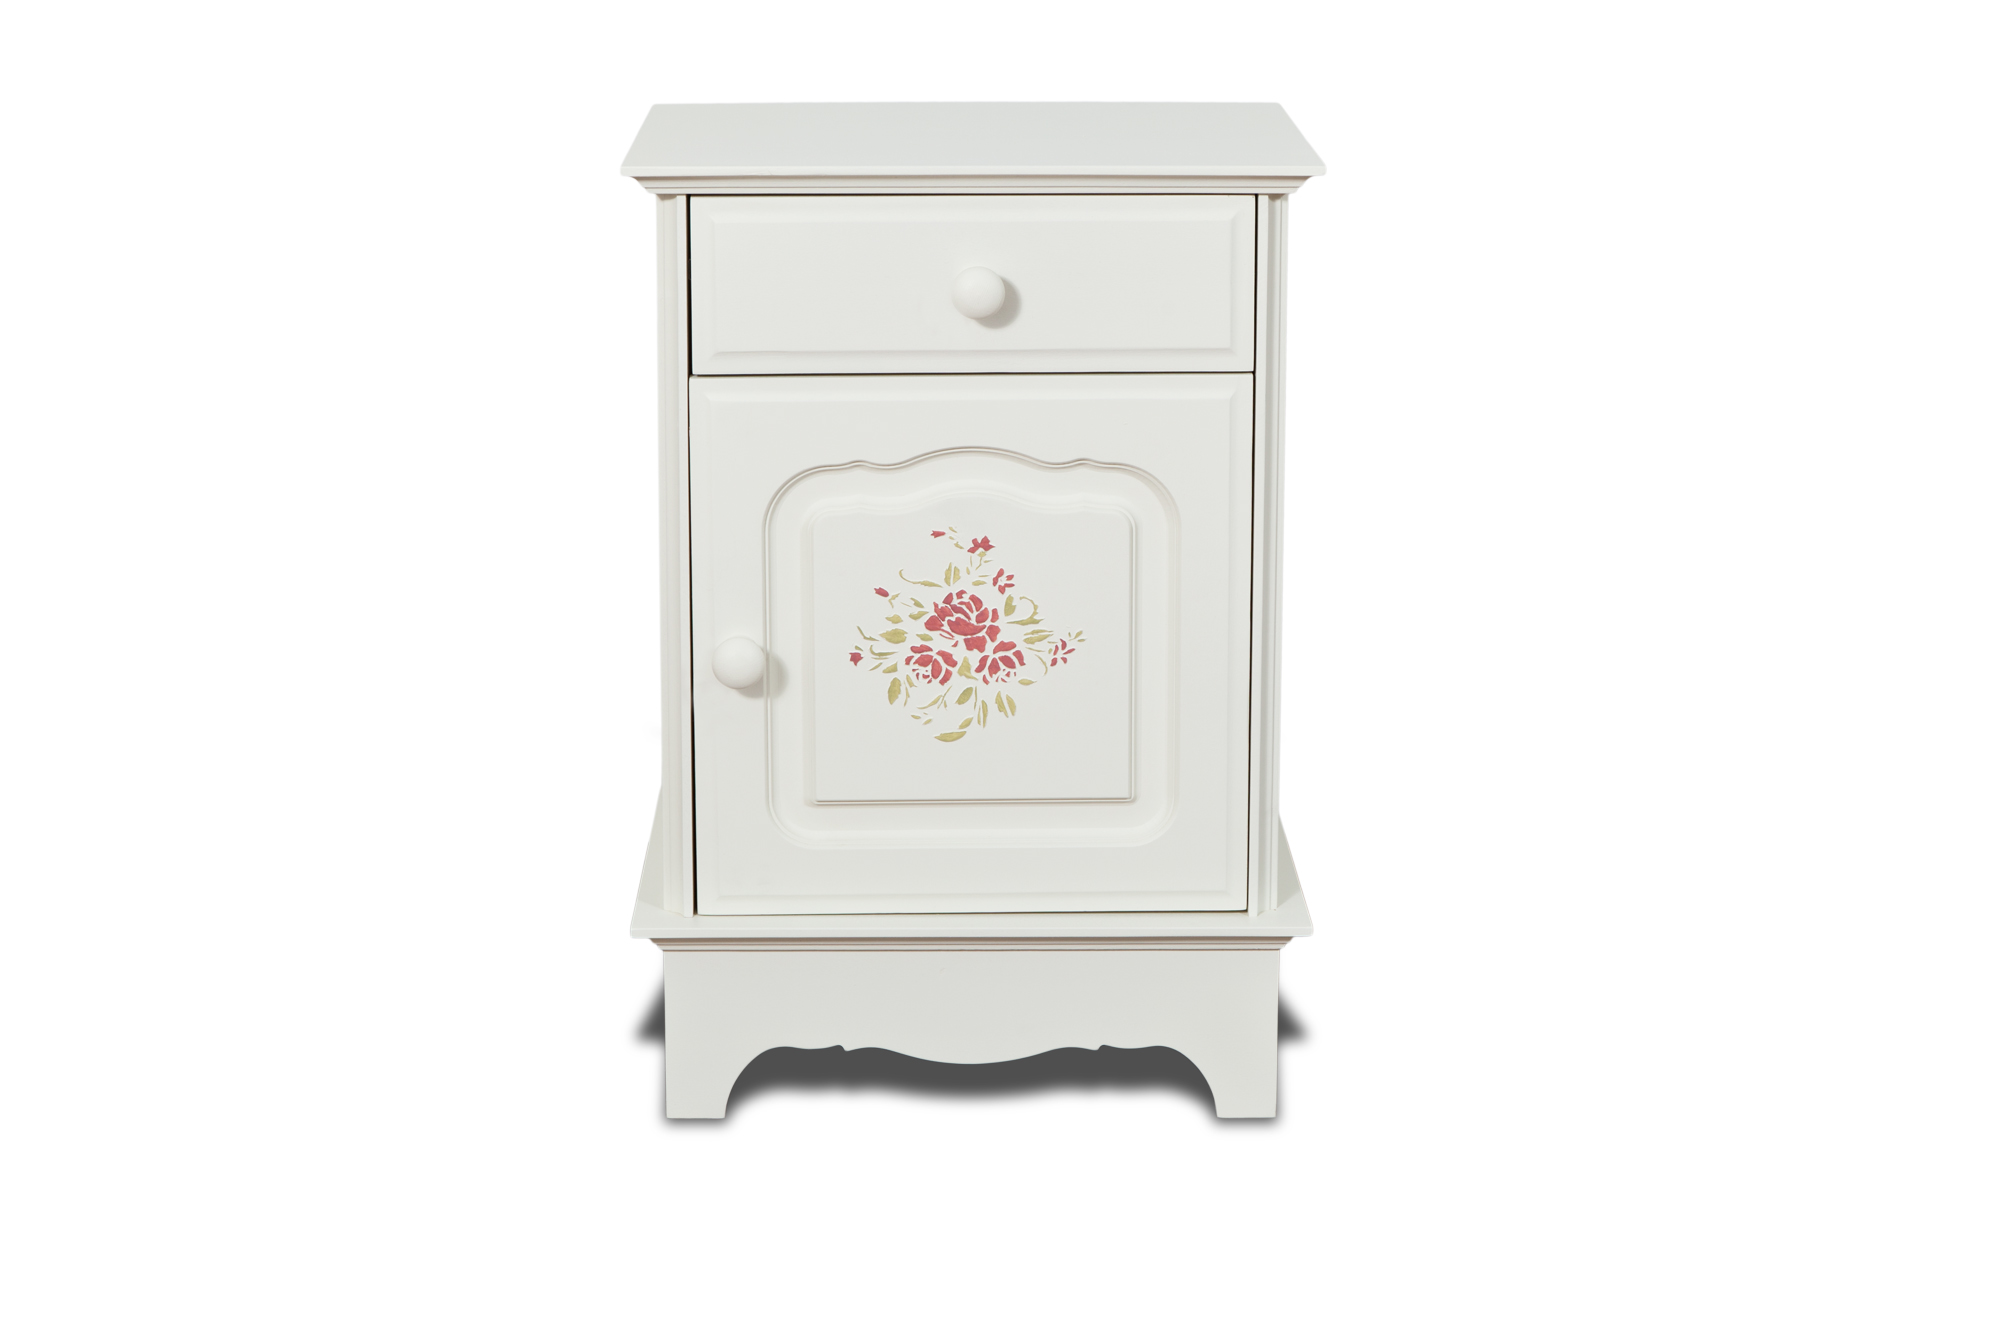 Тумбочка Belle Fleur Color?Прикроватные тумбы, комоды, столики<br>Отделка: Belle Fleur Color? - орнамент из роз.<br><br>Material: Береза<br>Width см: 45<br>Depth см: 32,5<br>Height см: 65